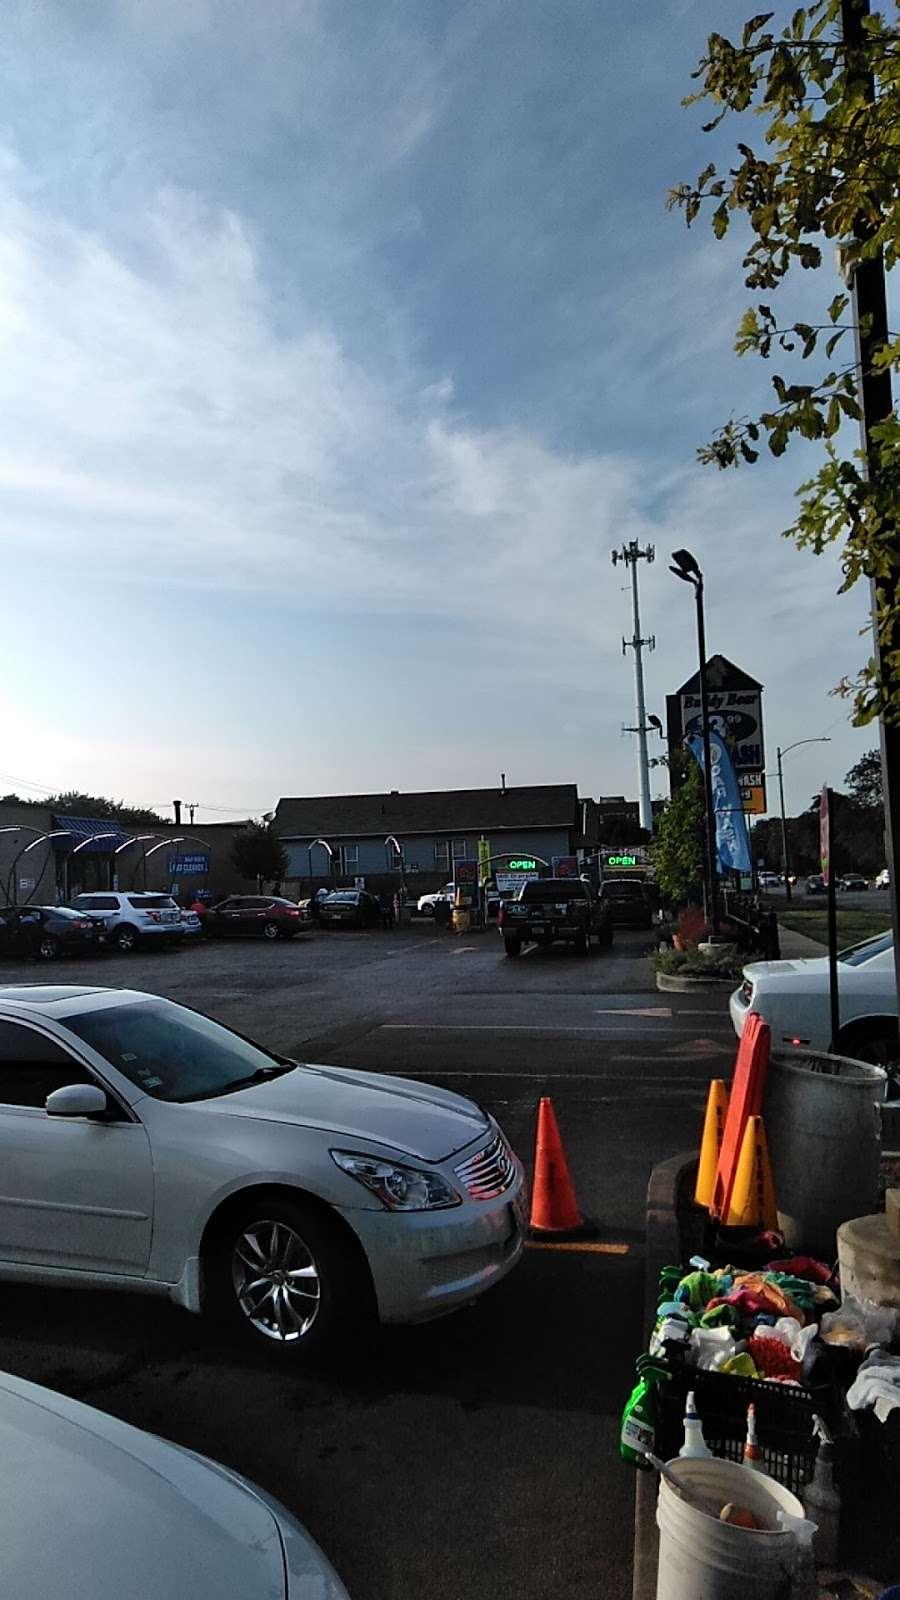 Buddy Bear Car Wash - car wash  | Photo 10 of 10 | Address: 4130 S Western Ave, Chicago, IL 60609, USA | Phone: (773) 847-1221